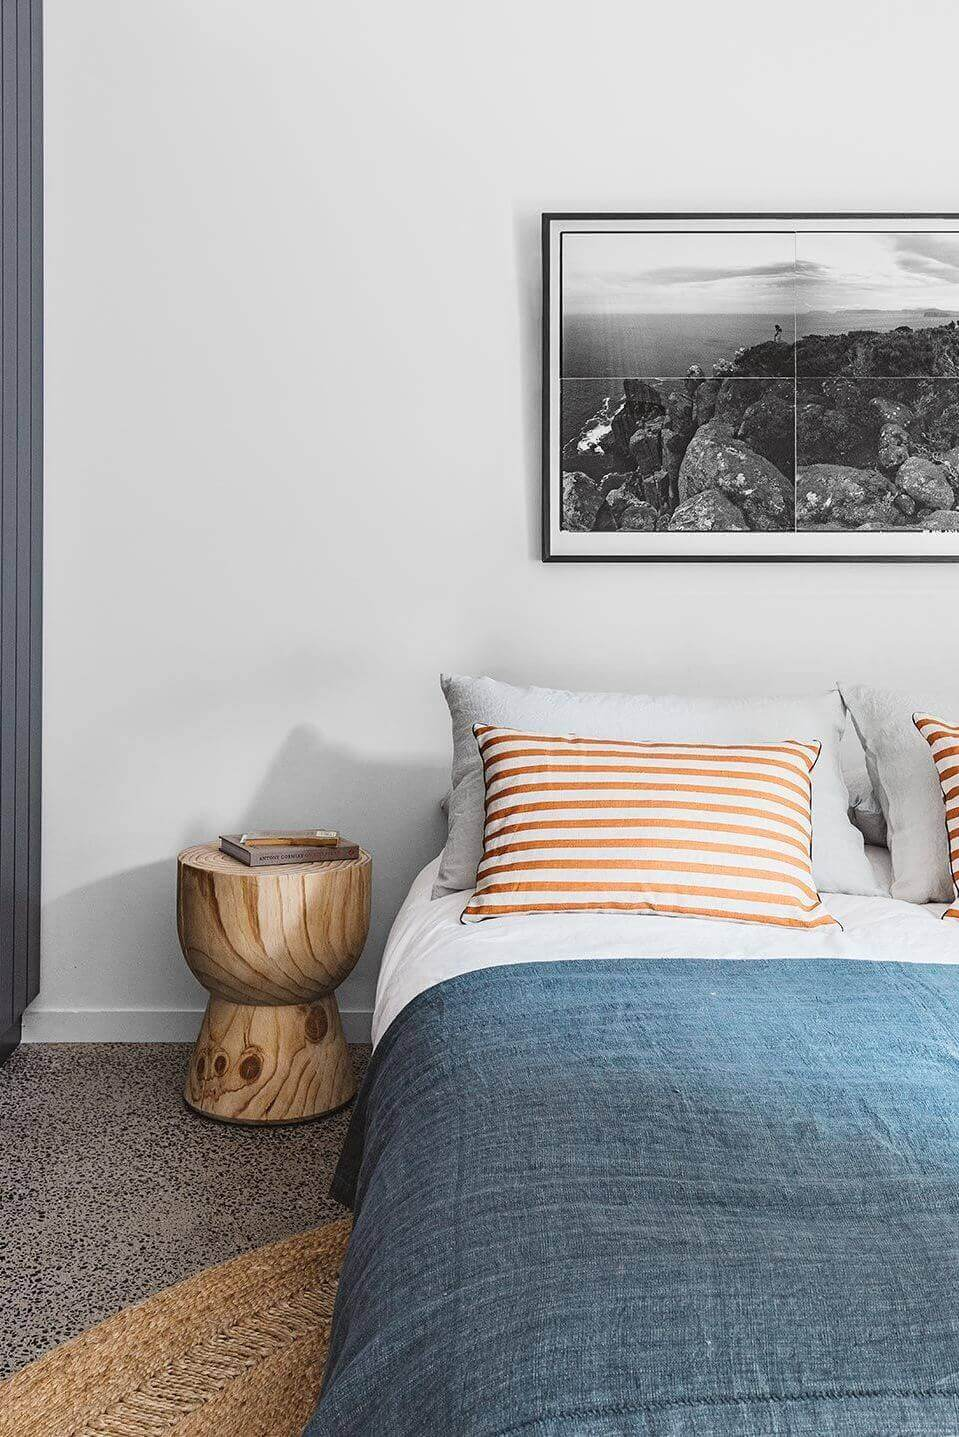 Mens Bedroom Ideas ikea 17 Create a Sense of Place